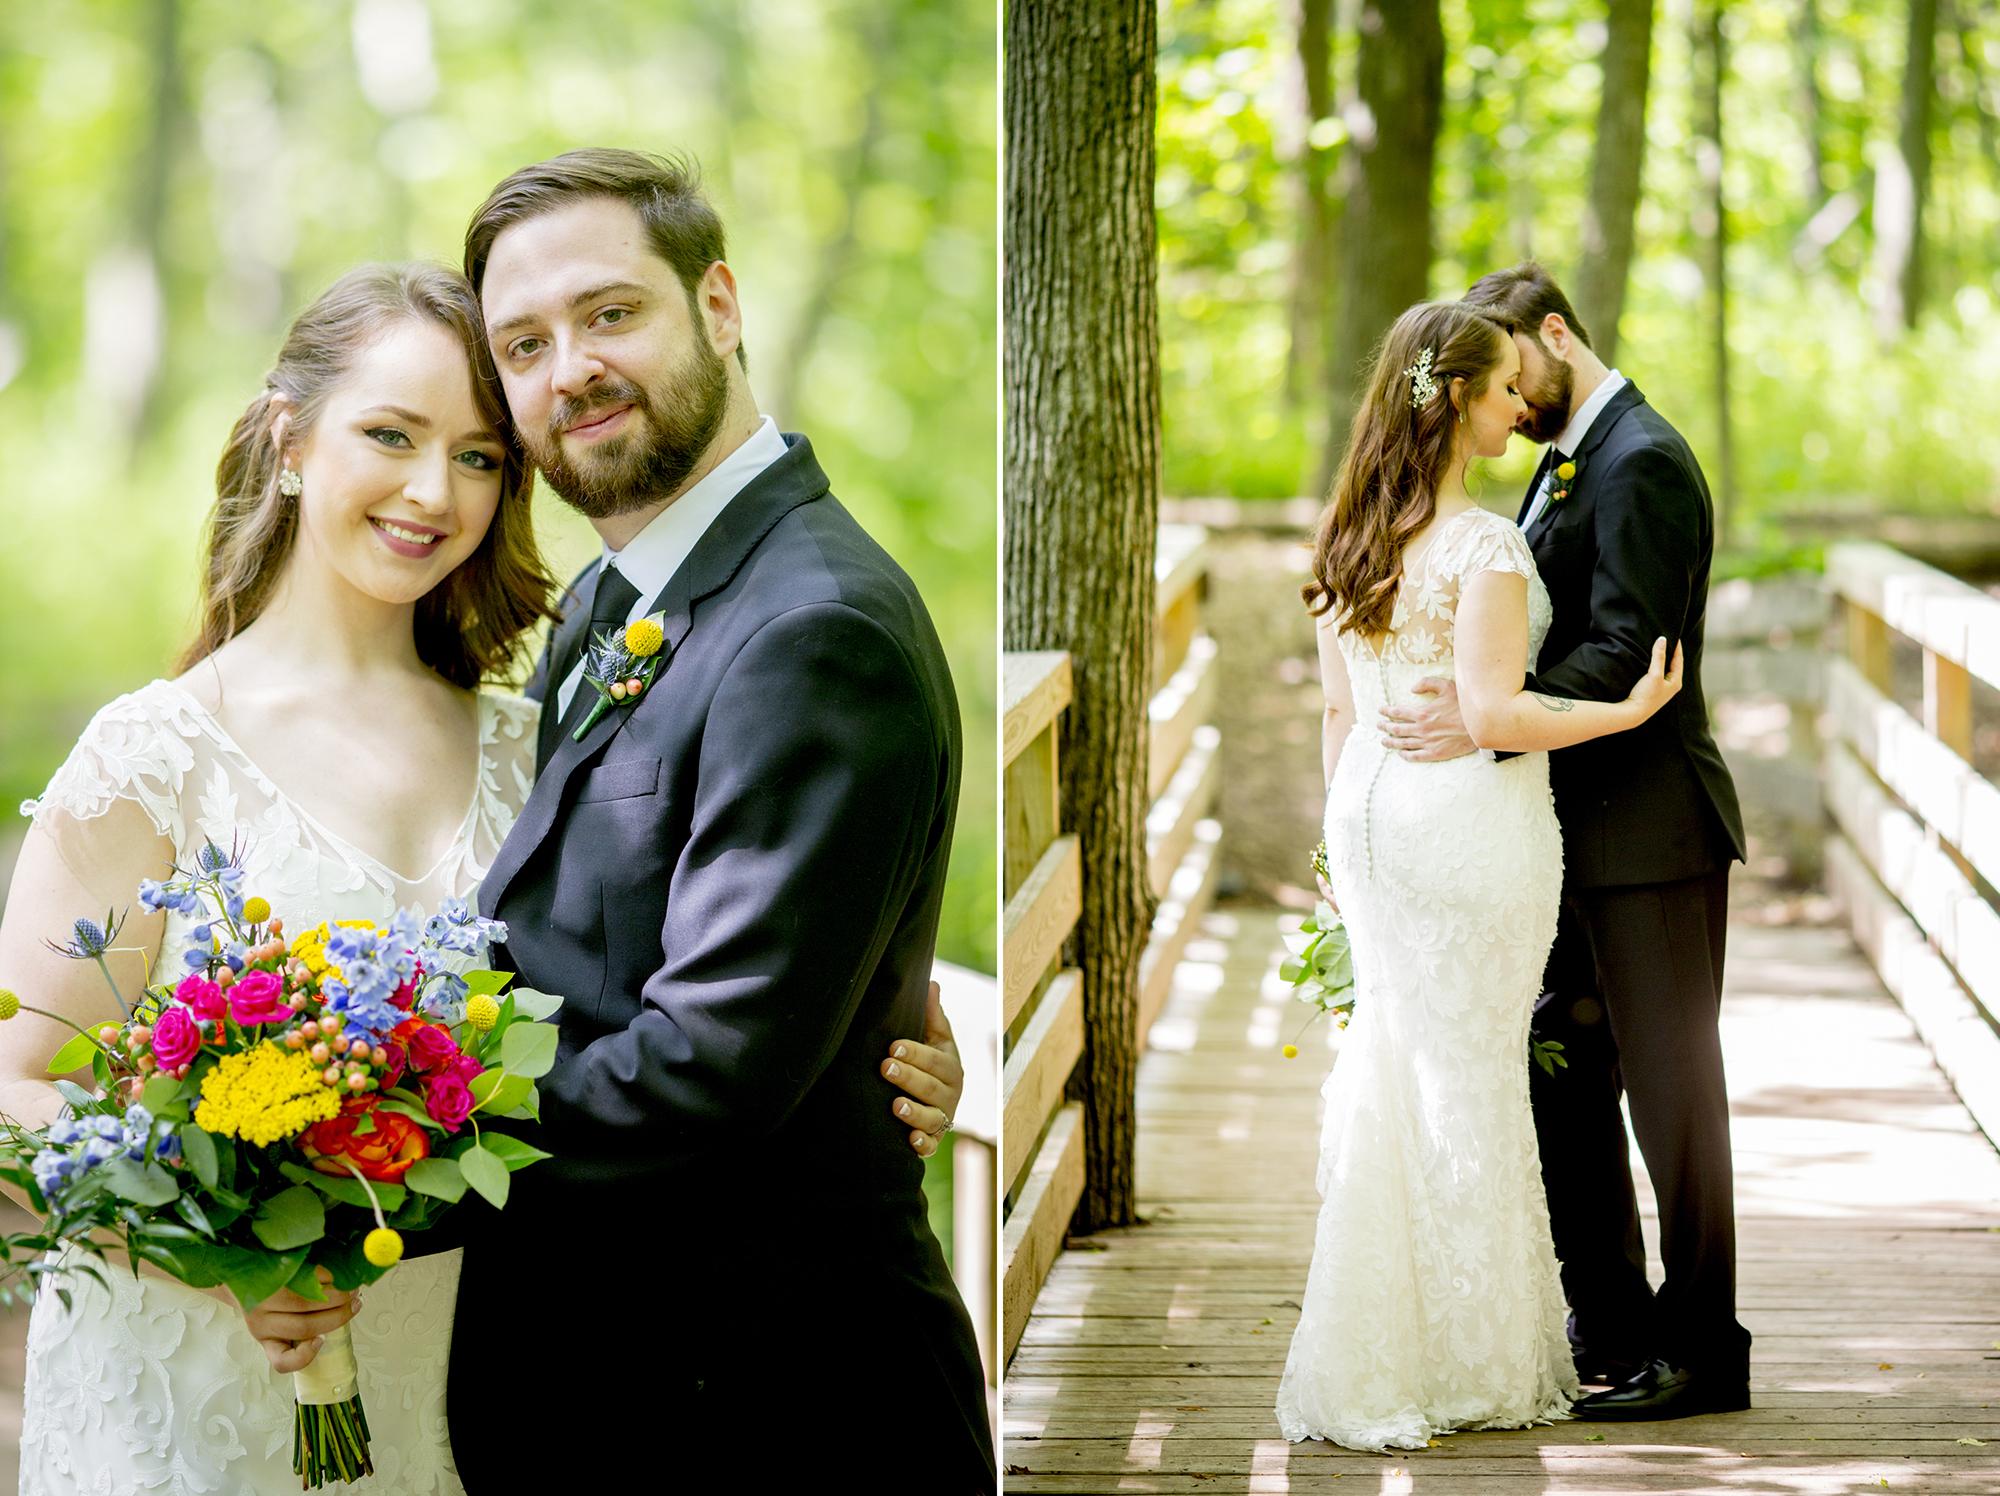 Seriously_Sabrina_Photography_Milwaukee_Wisconsin_Wedding_Schlitz_Audubon_Nature_Center_BrunderRife25.jpg